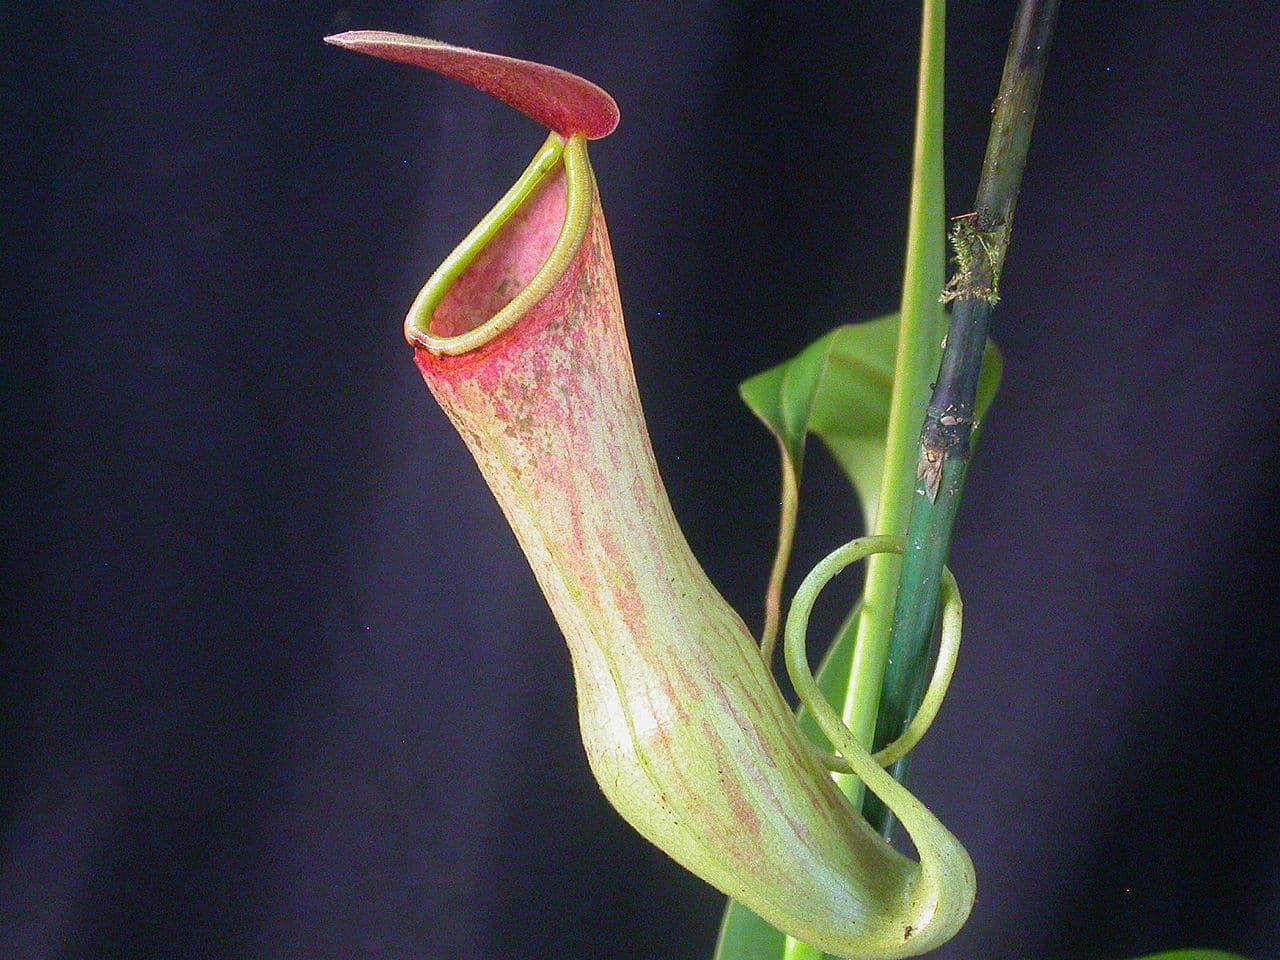 Vista de la Nepenthes khasiana